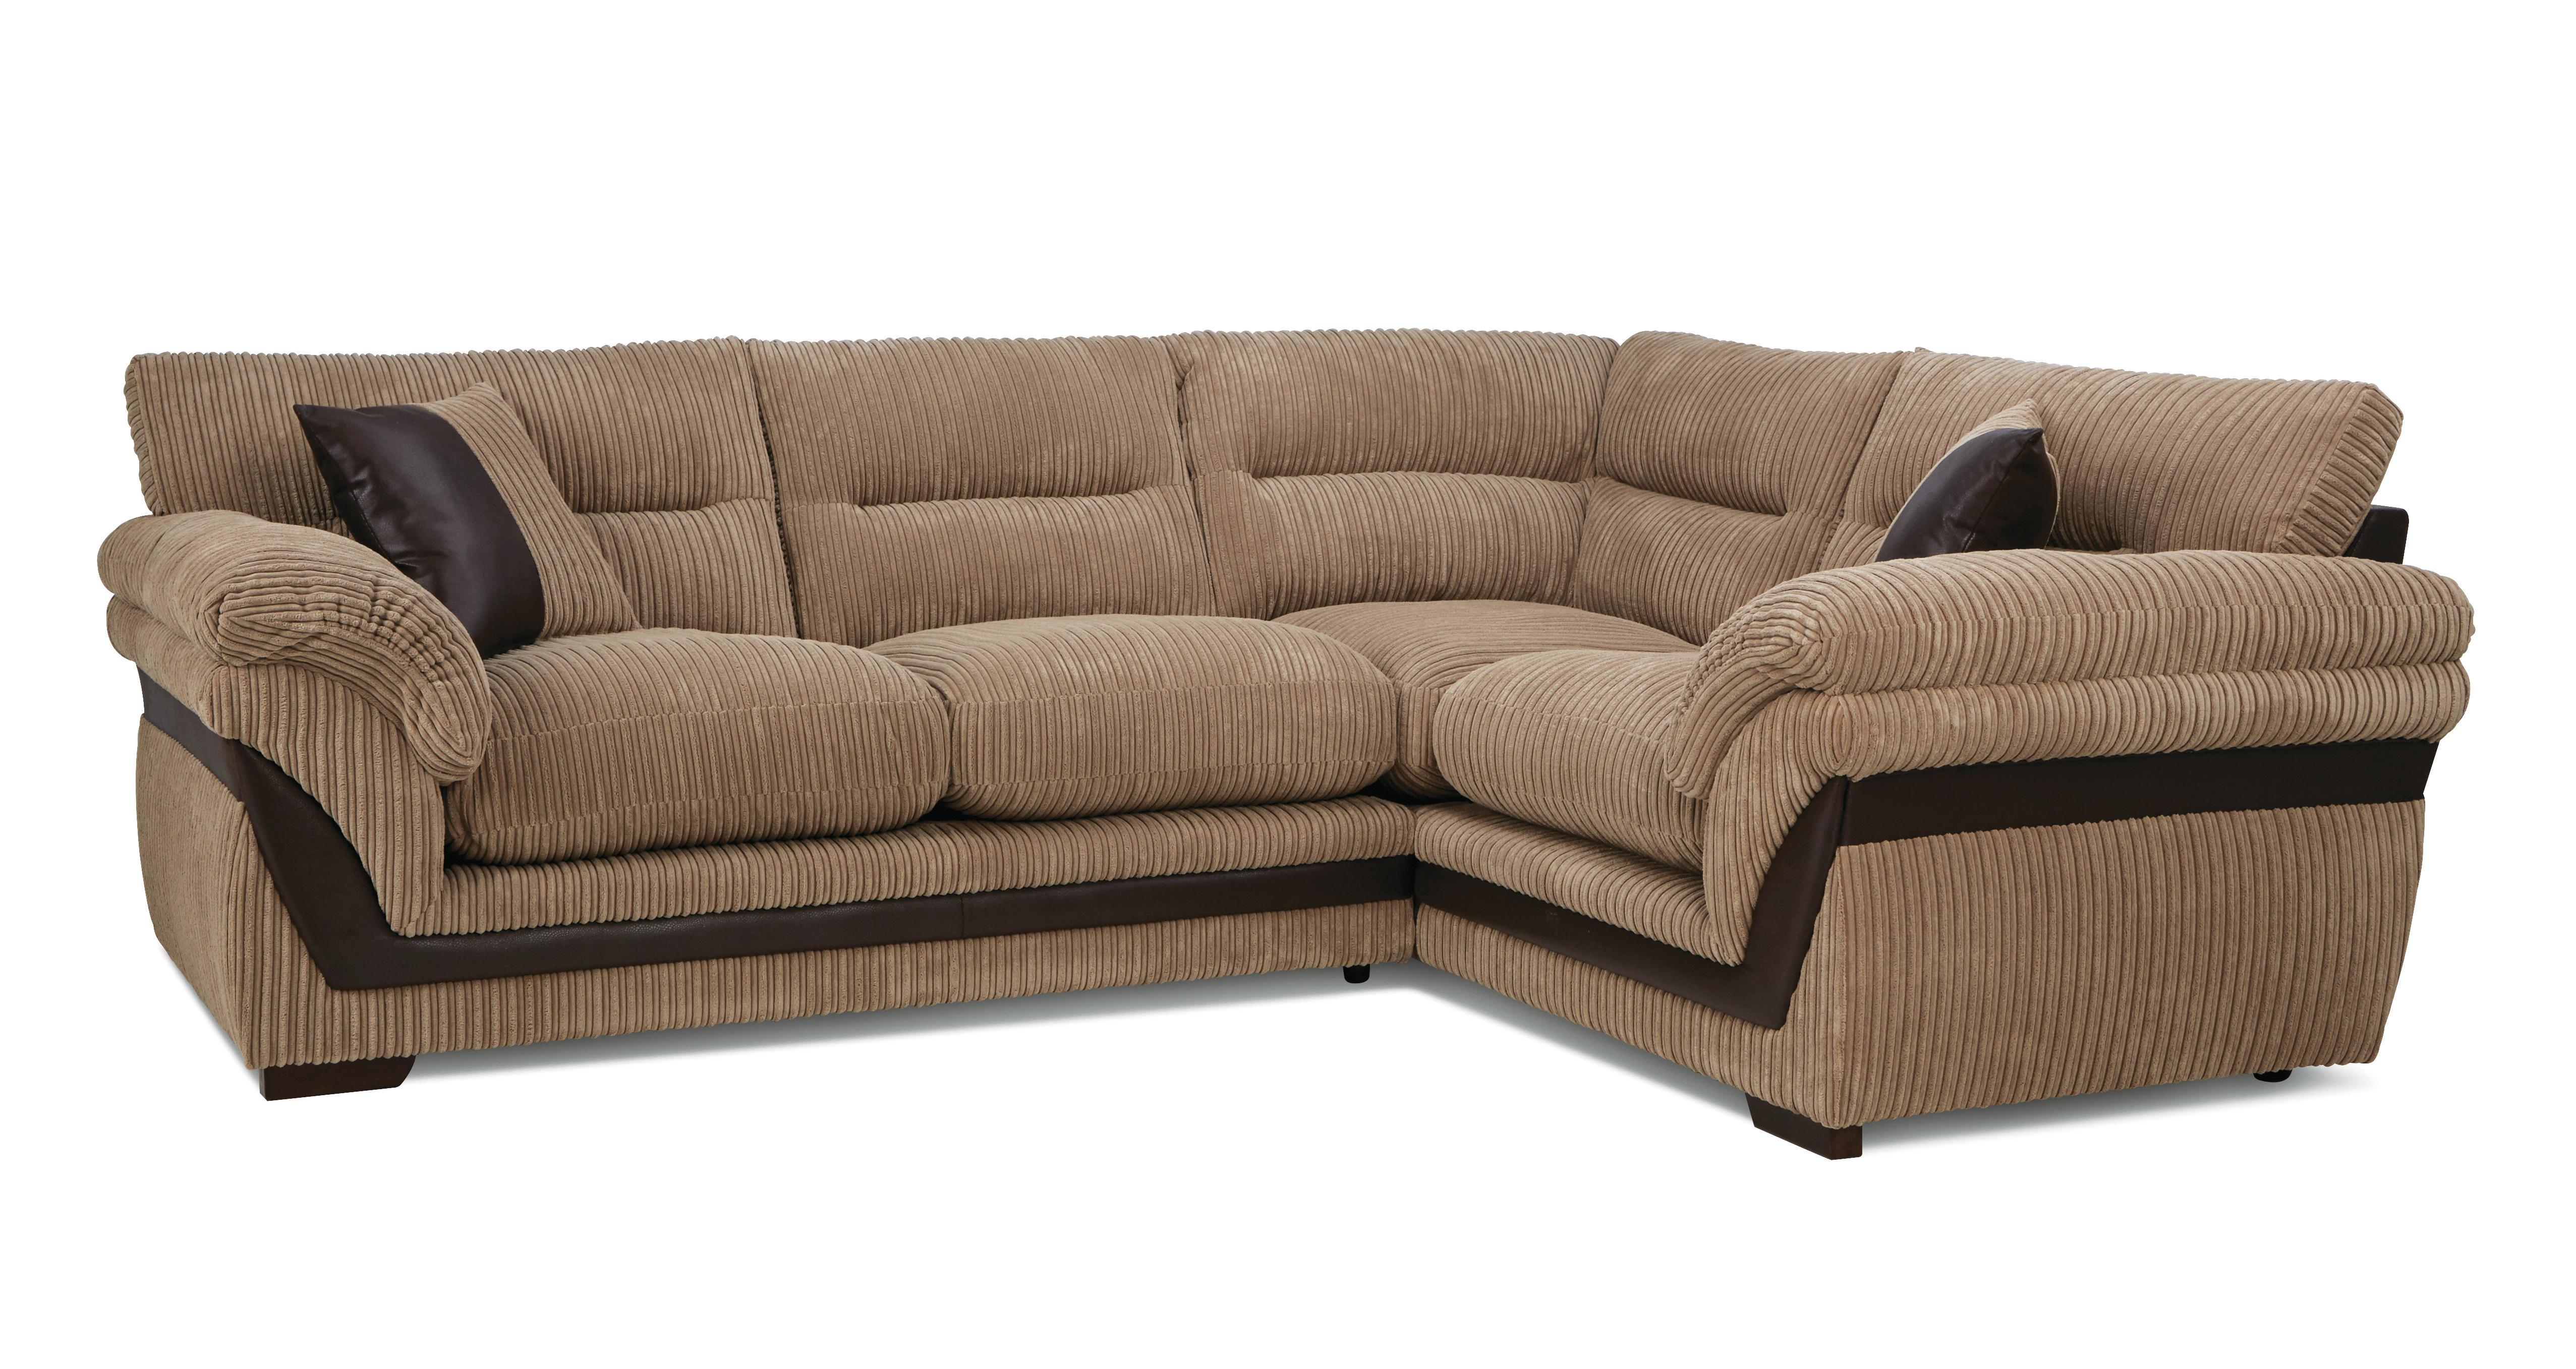 Samson Corner Sofa Bed | Taraba Home Review